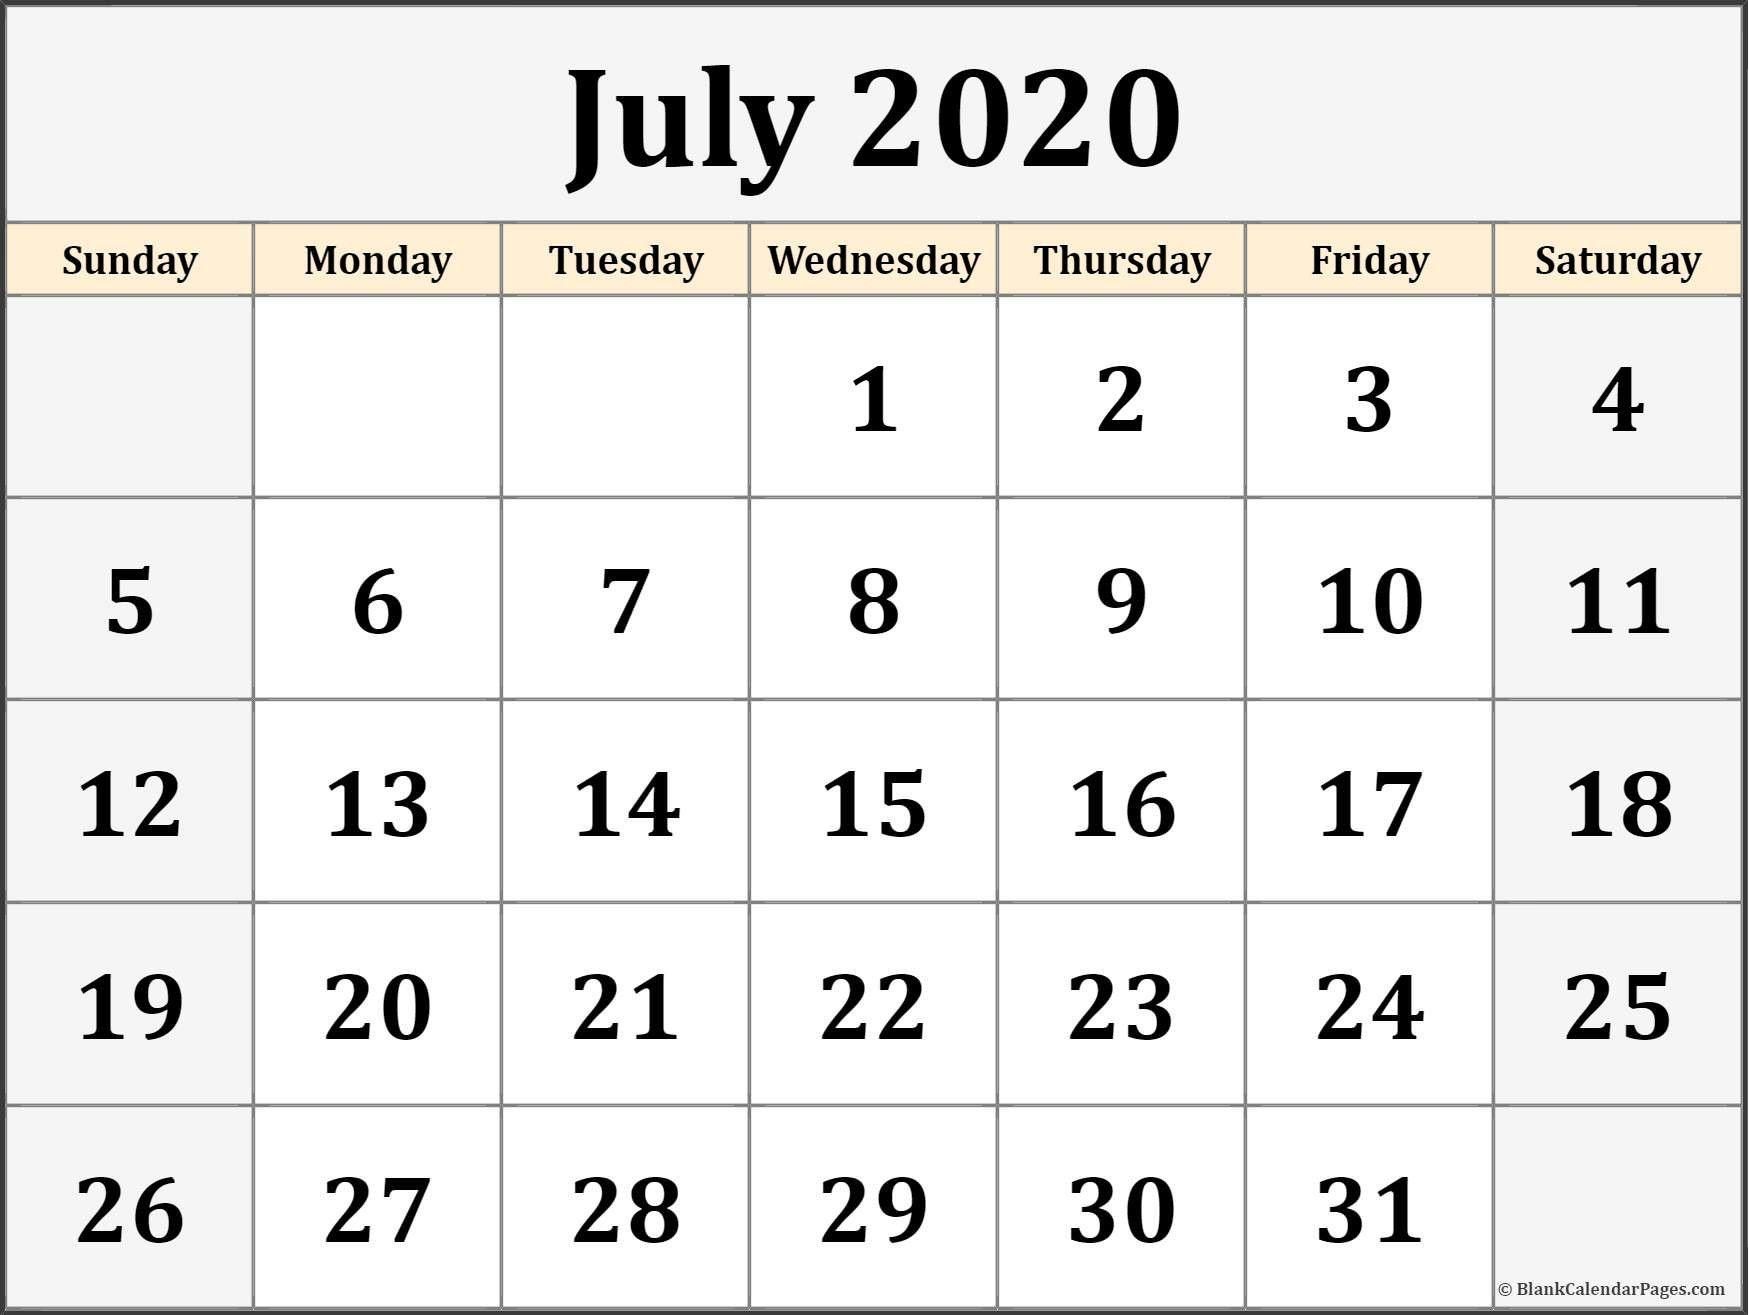 July 2020 Calendar July 2020 Calendar July 2020 Calendar Free Blank July 2020 Printable Monthly Calendar Printable Calendar Printables Blank Calendar Template